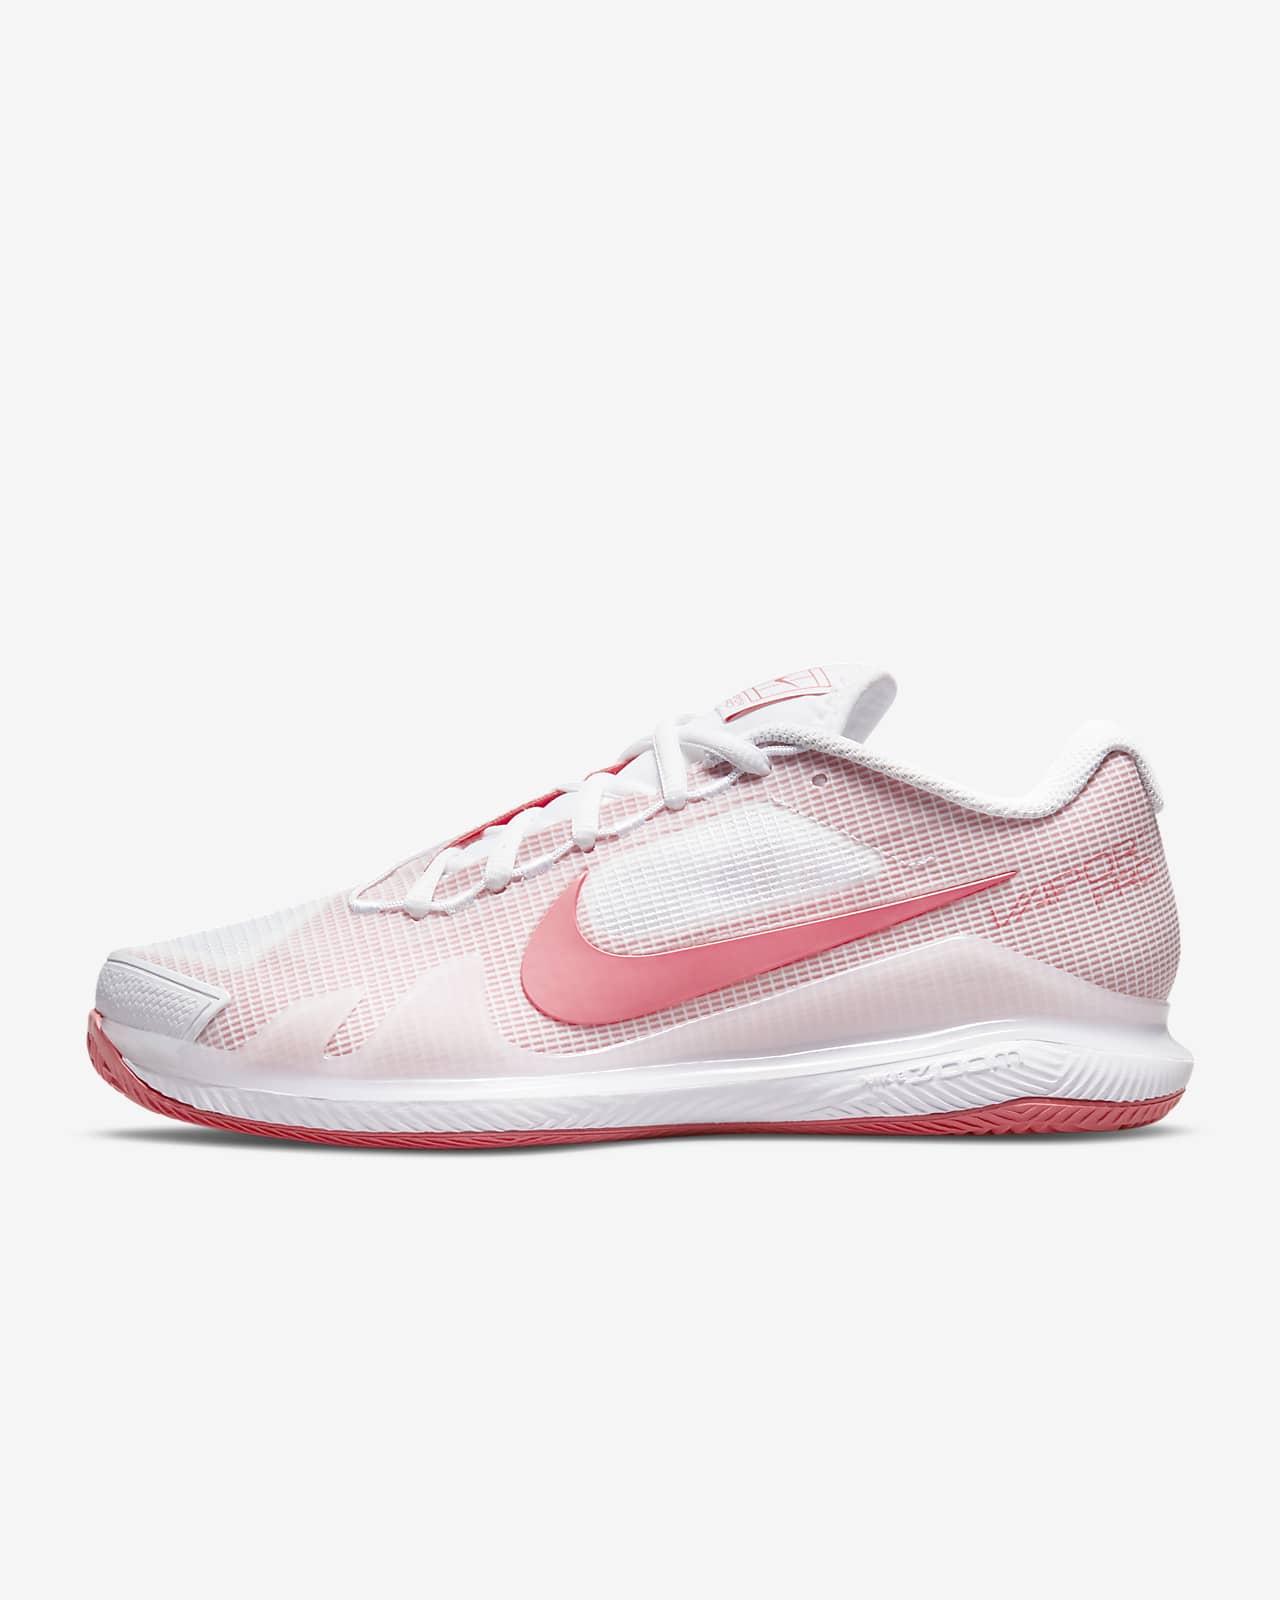 Scarpa da tennis per campi in terra rossa NikeCourt Air Zoom Vapor Pro - Donna